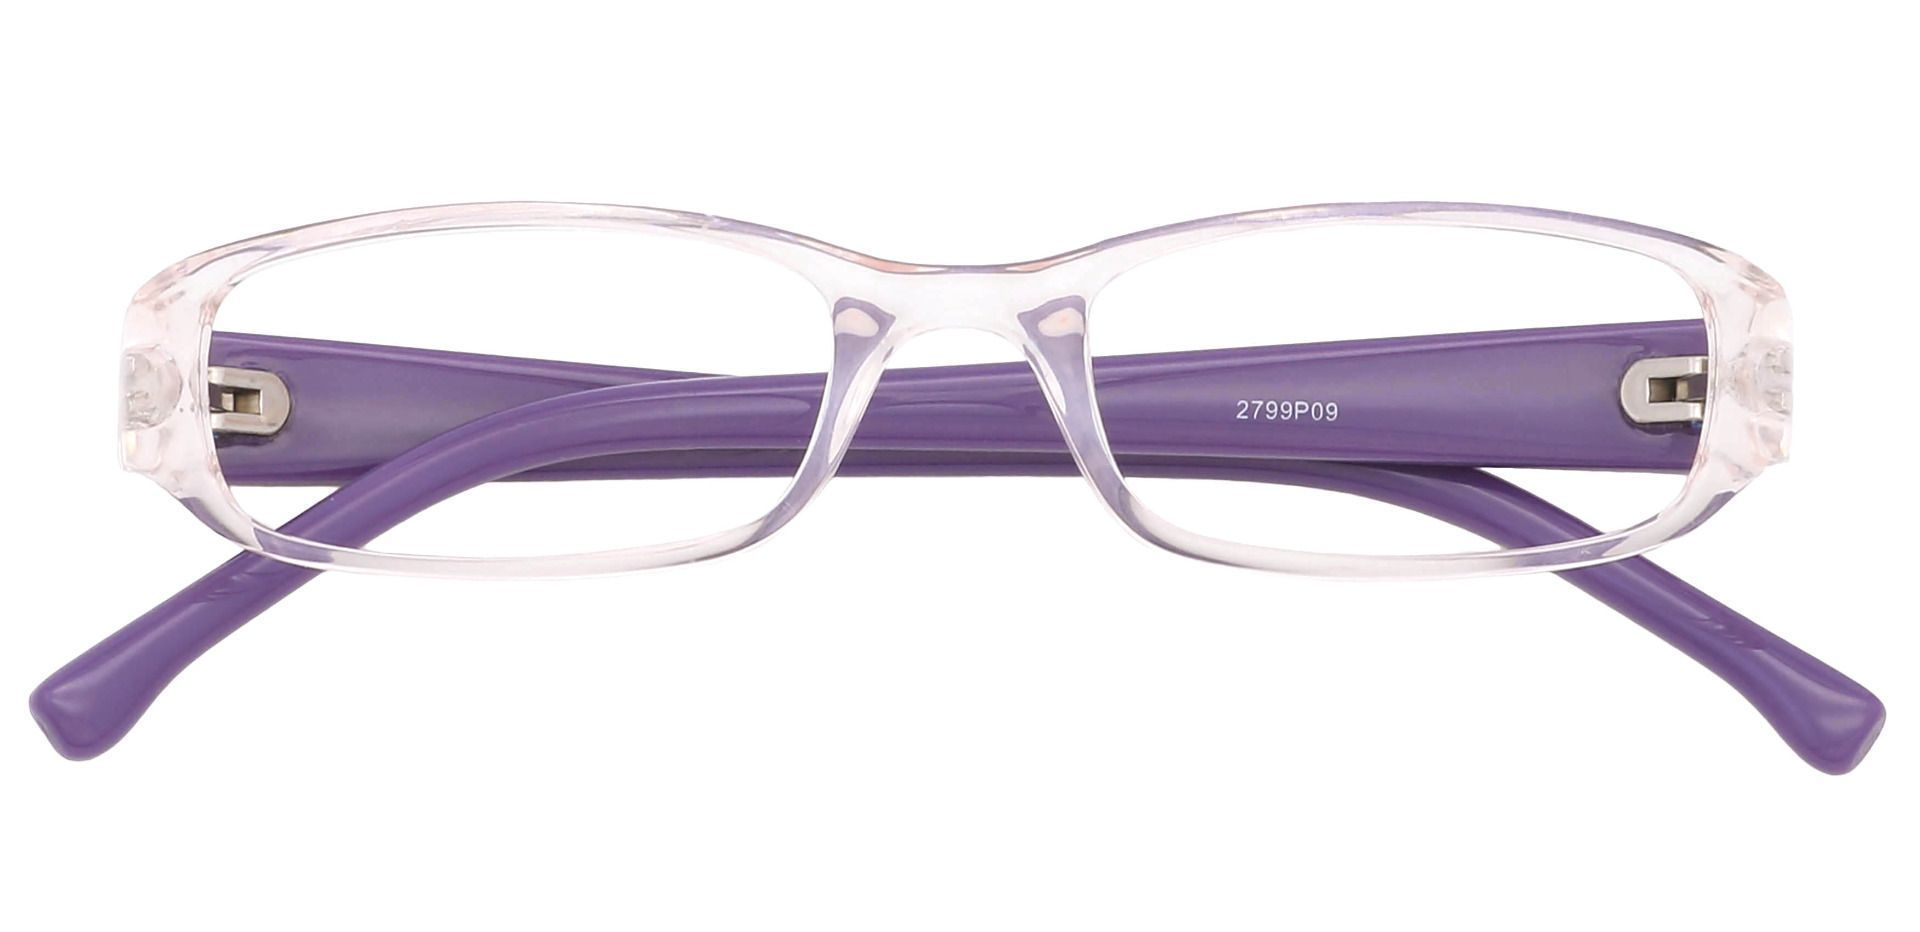 Laurel Rectangle Non-Rx Glasses - Pale Pink Crystal